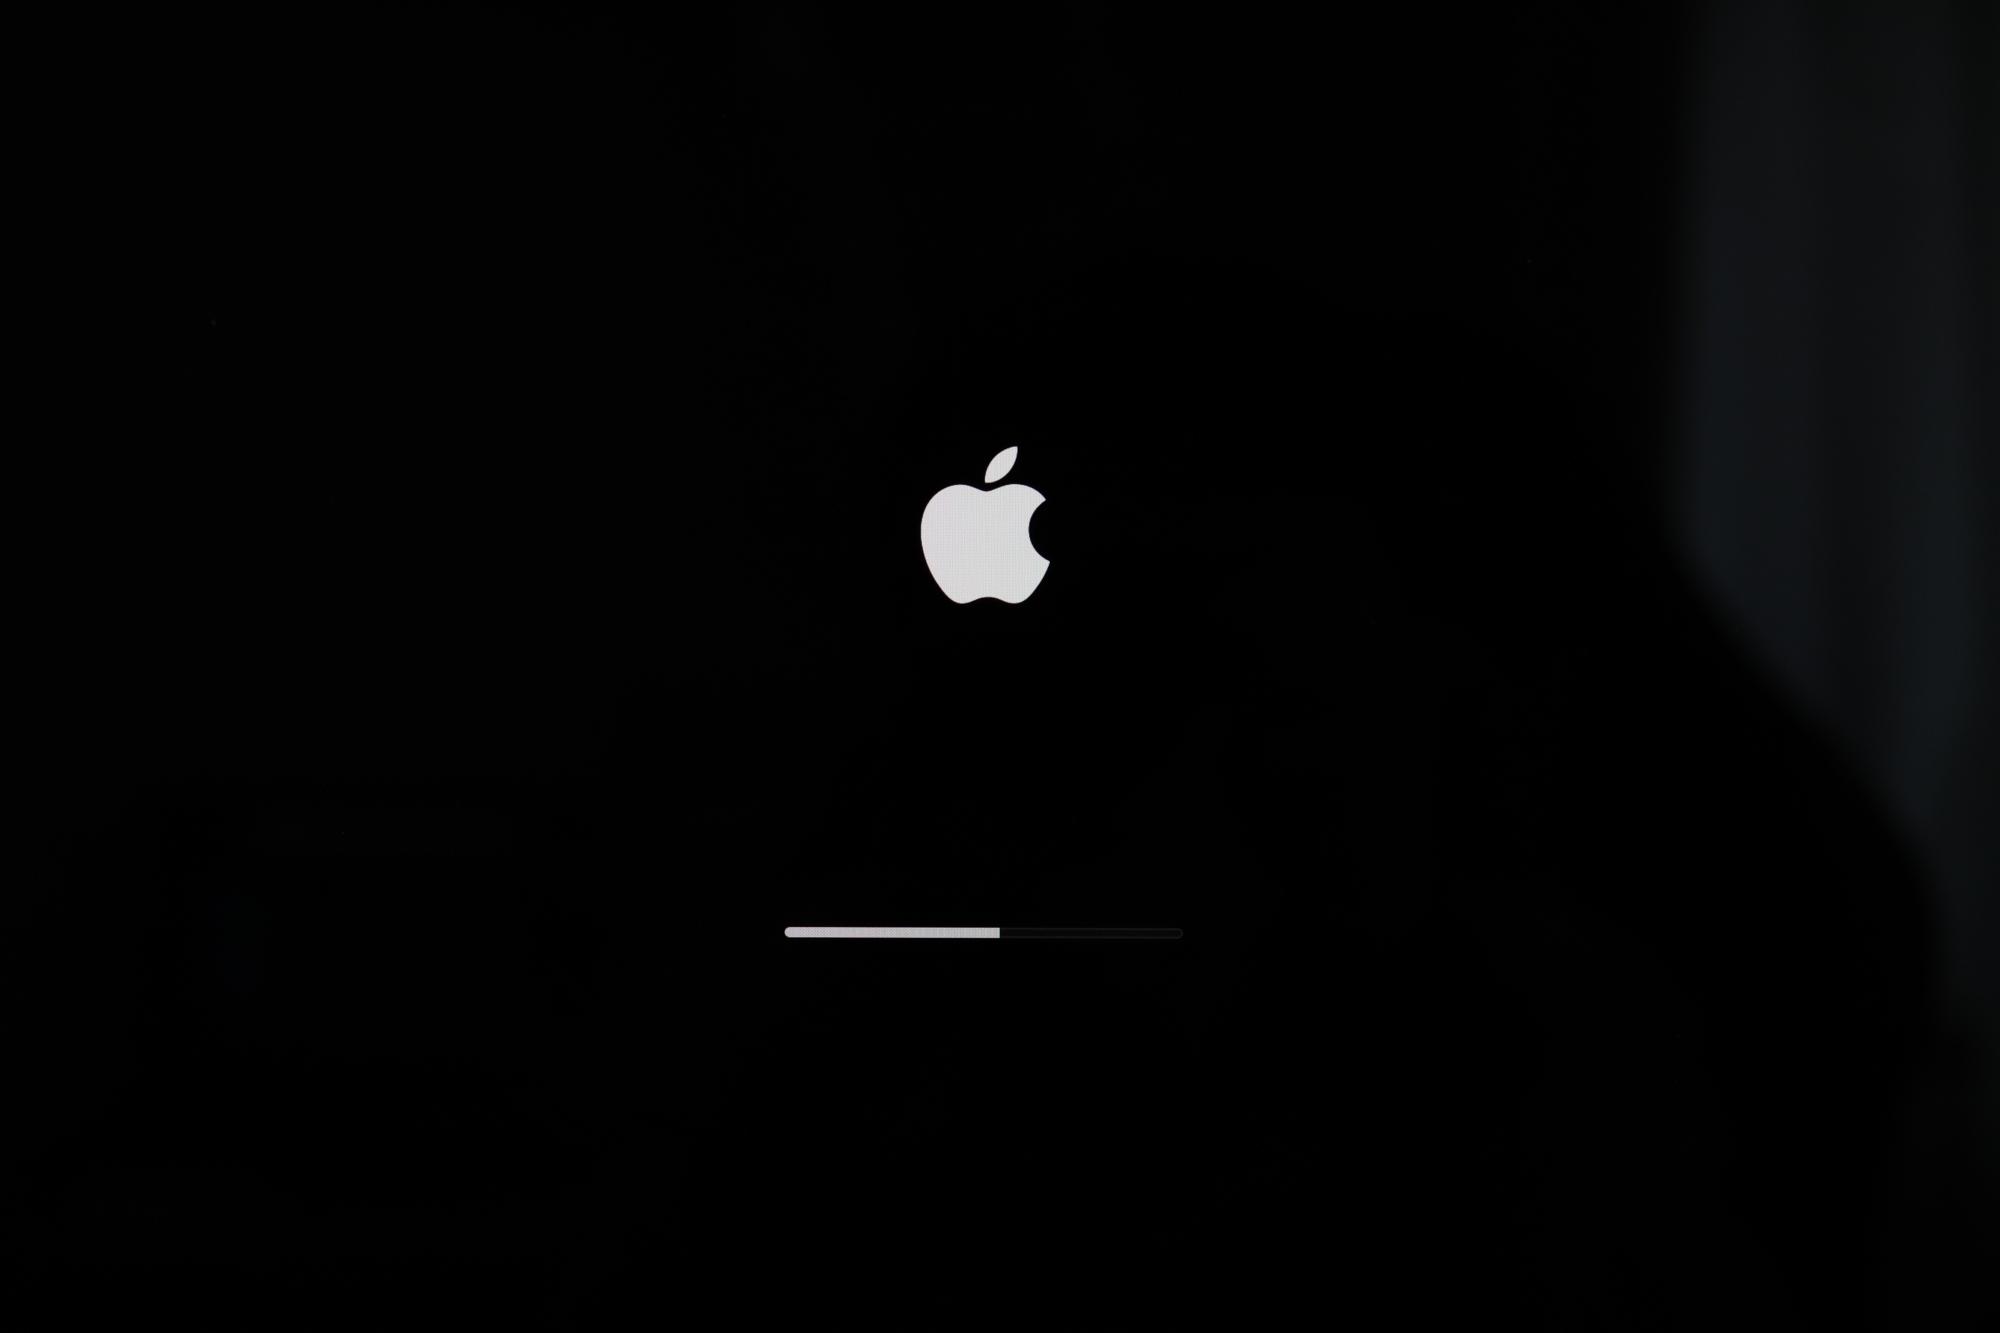 macOSのインストール